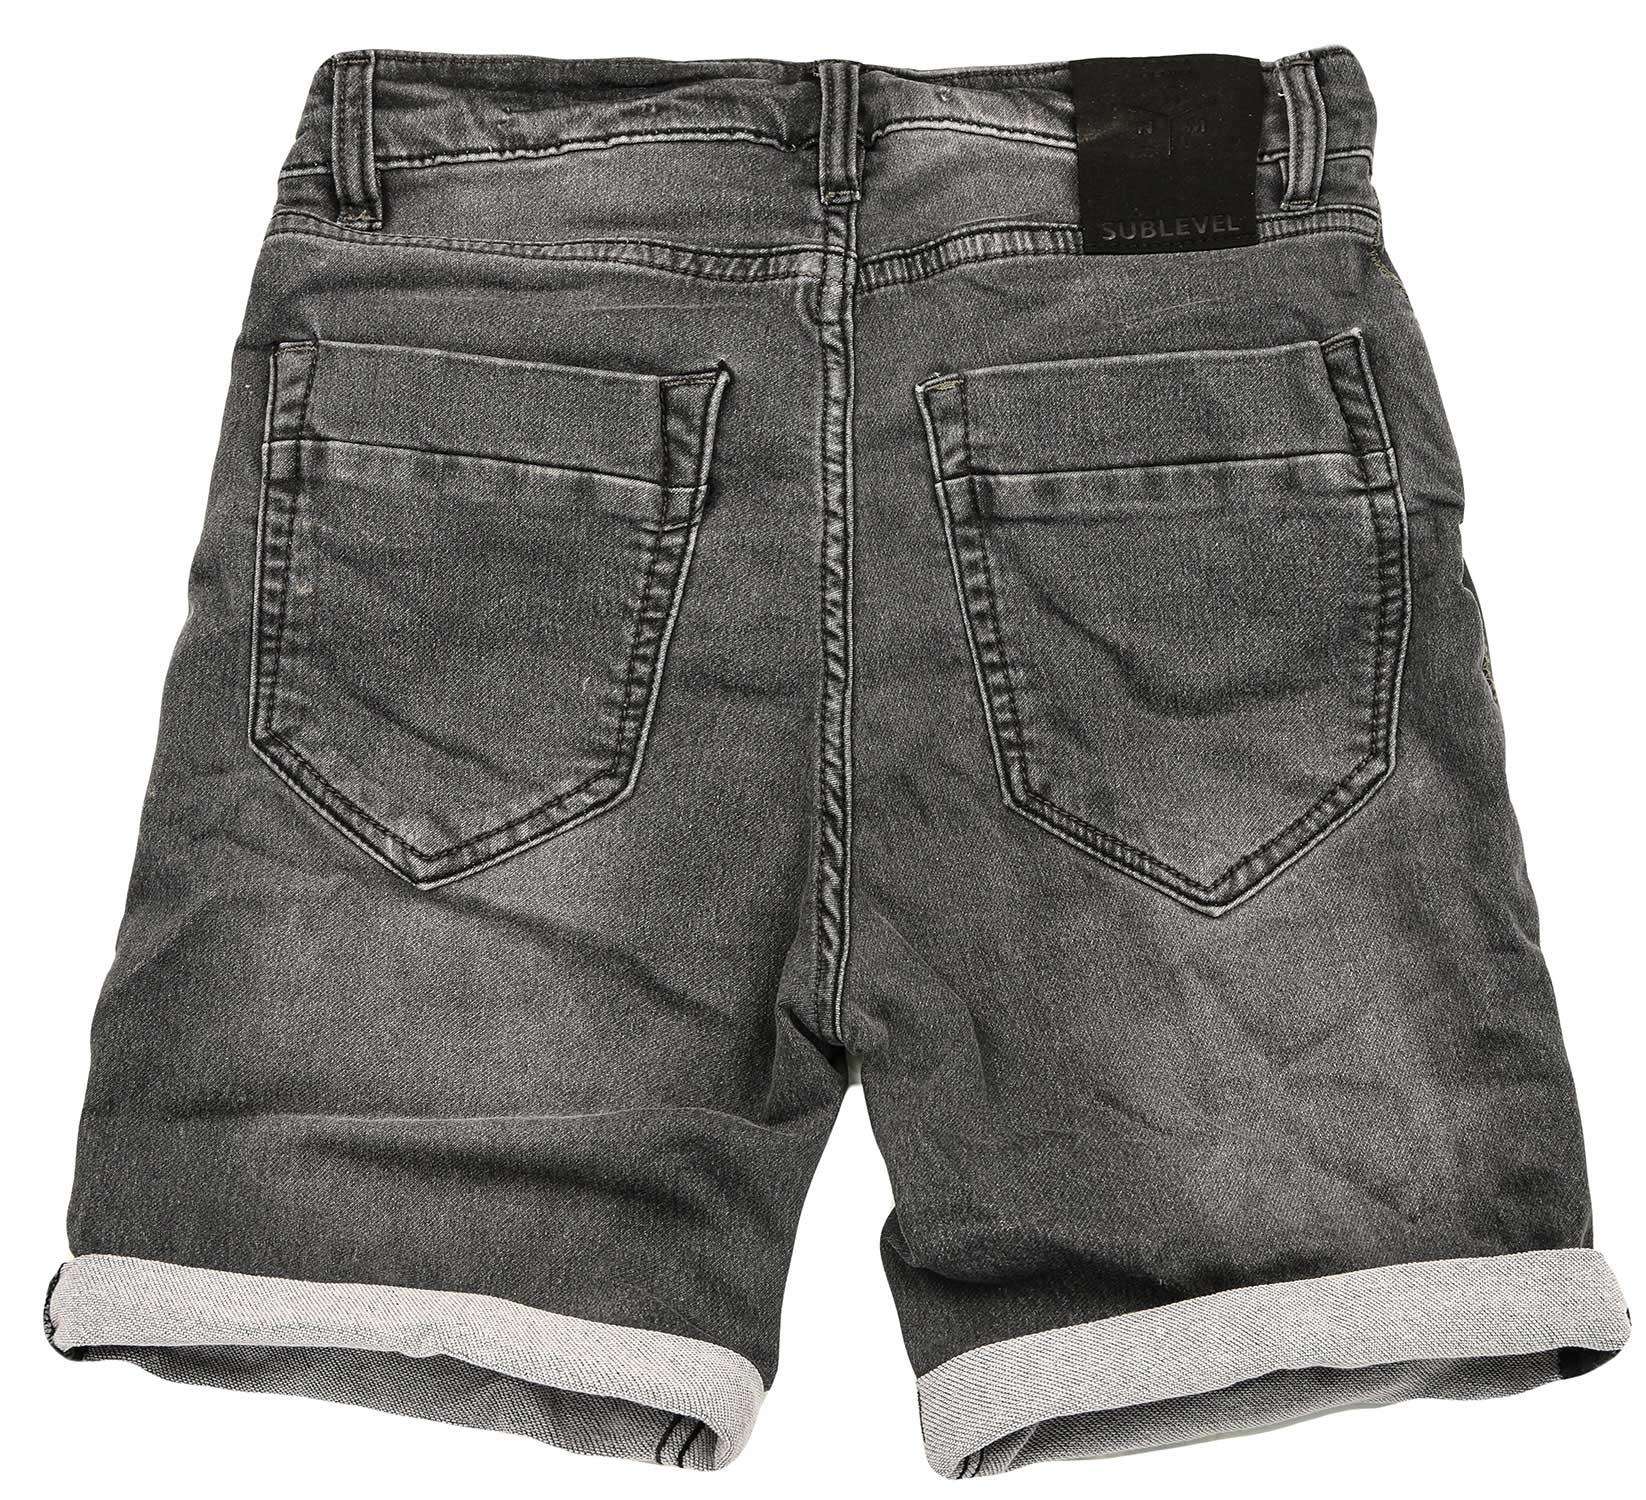 Sublevel-Herren-Sweat-Jeans-Shorts-kurze-Hose-Bermuda-Sommer-Sweathose-Slim-NEU Indexbild 42